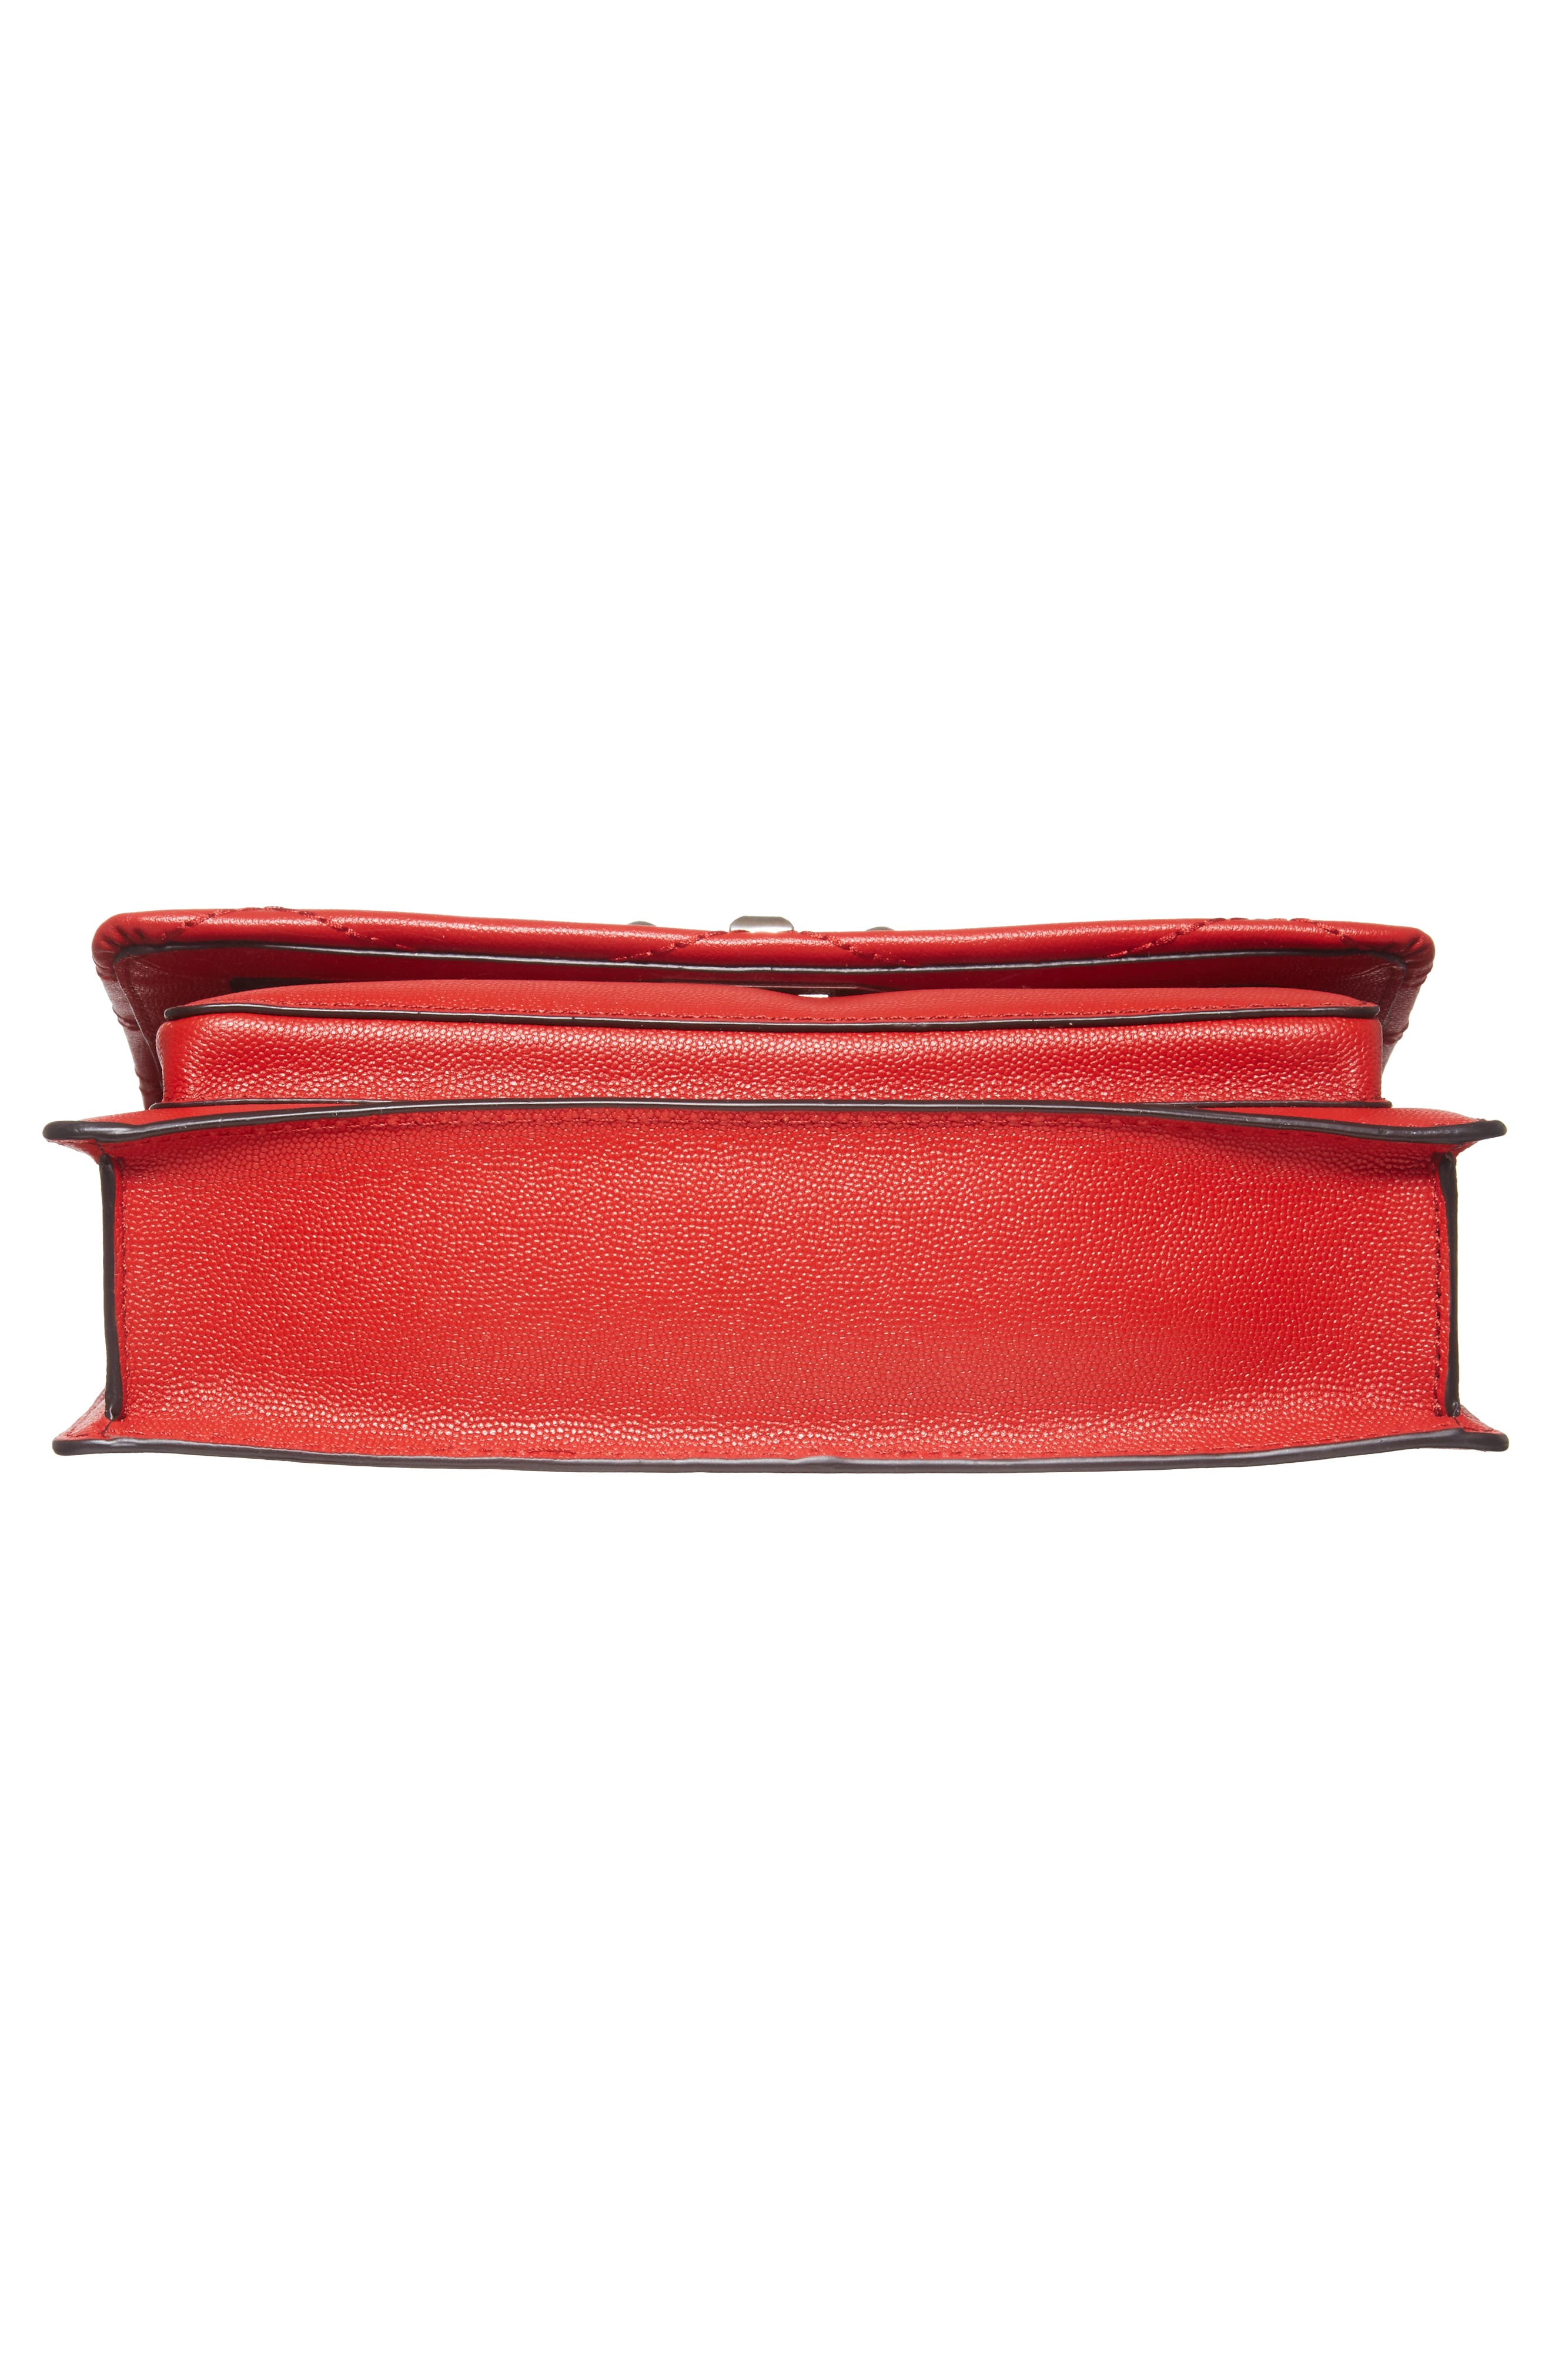 Medium Je T'aime Convertible Leather Crossbody Bag,                             Alternate thumbnail 57, color,